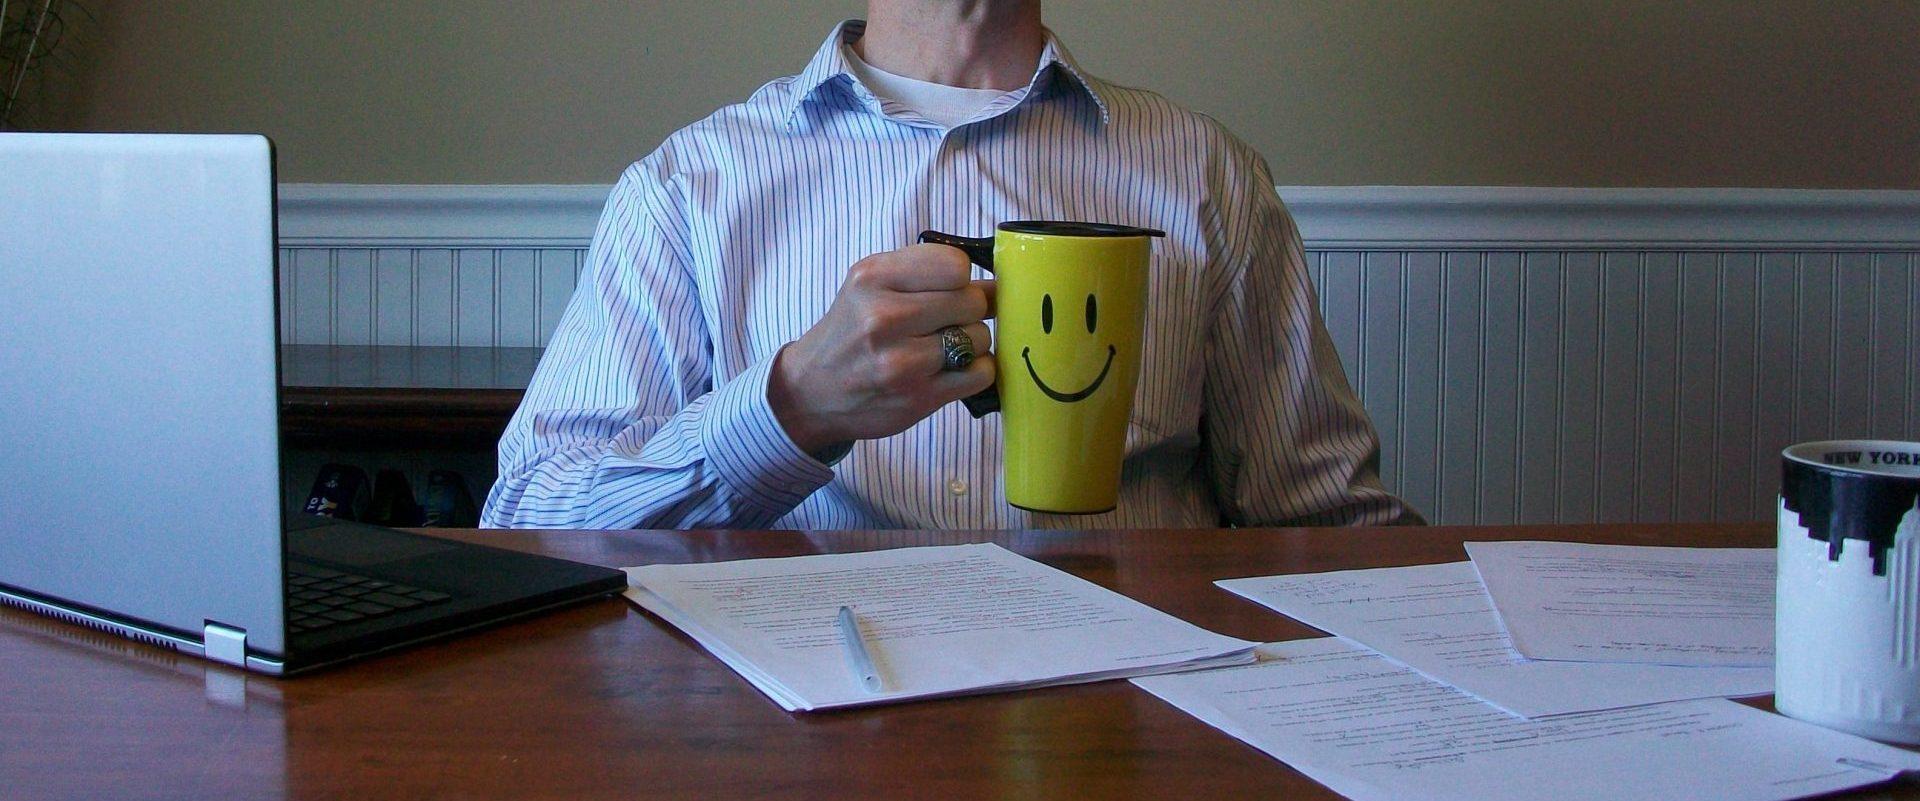 Author David McCaleb, holding a Happy Face mug of coffee